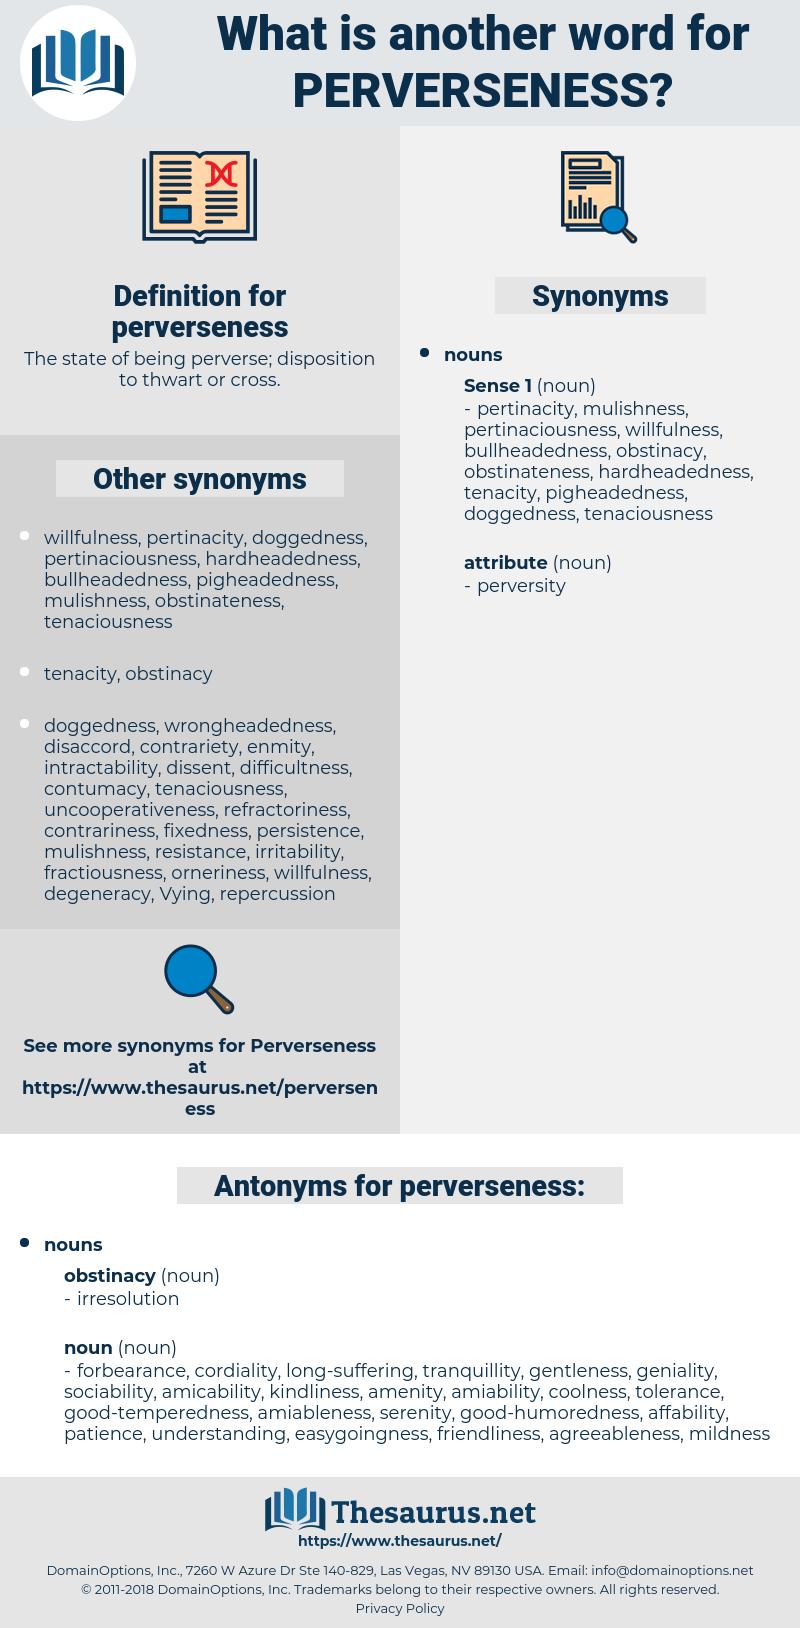 perverseness, synonym perverseness, another word for perverseness, words like perverseness, thesaurus perverseness